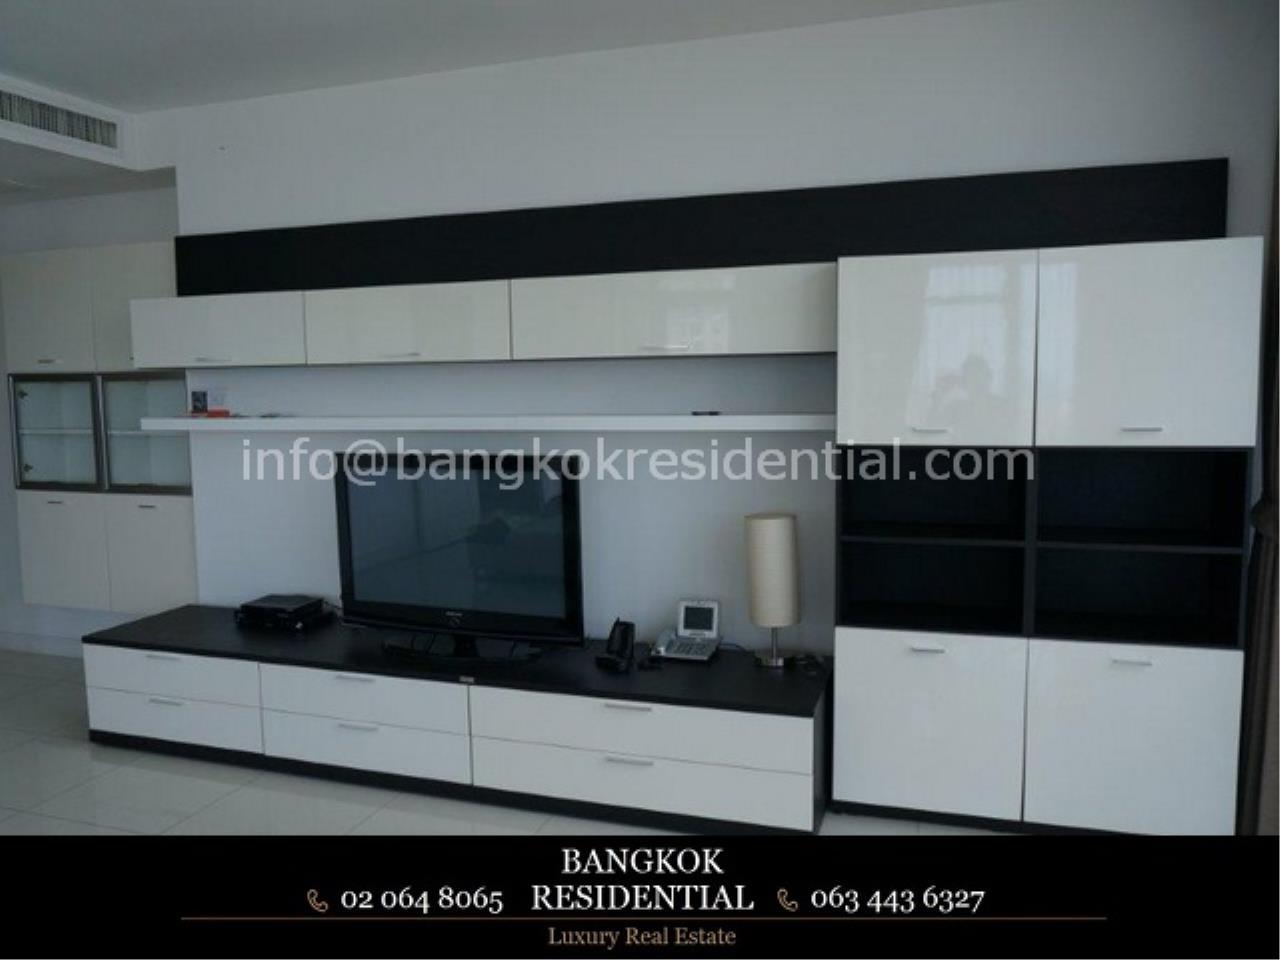 Bangkok Residential Agency's 3BR Athenee Residence For Sale Or Rent (BR3386CD) 2